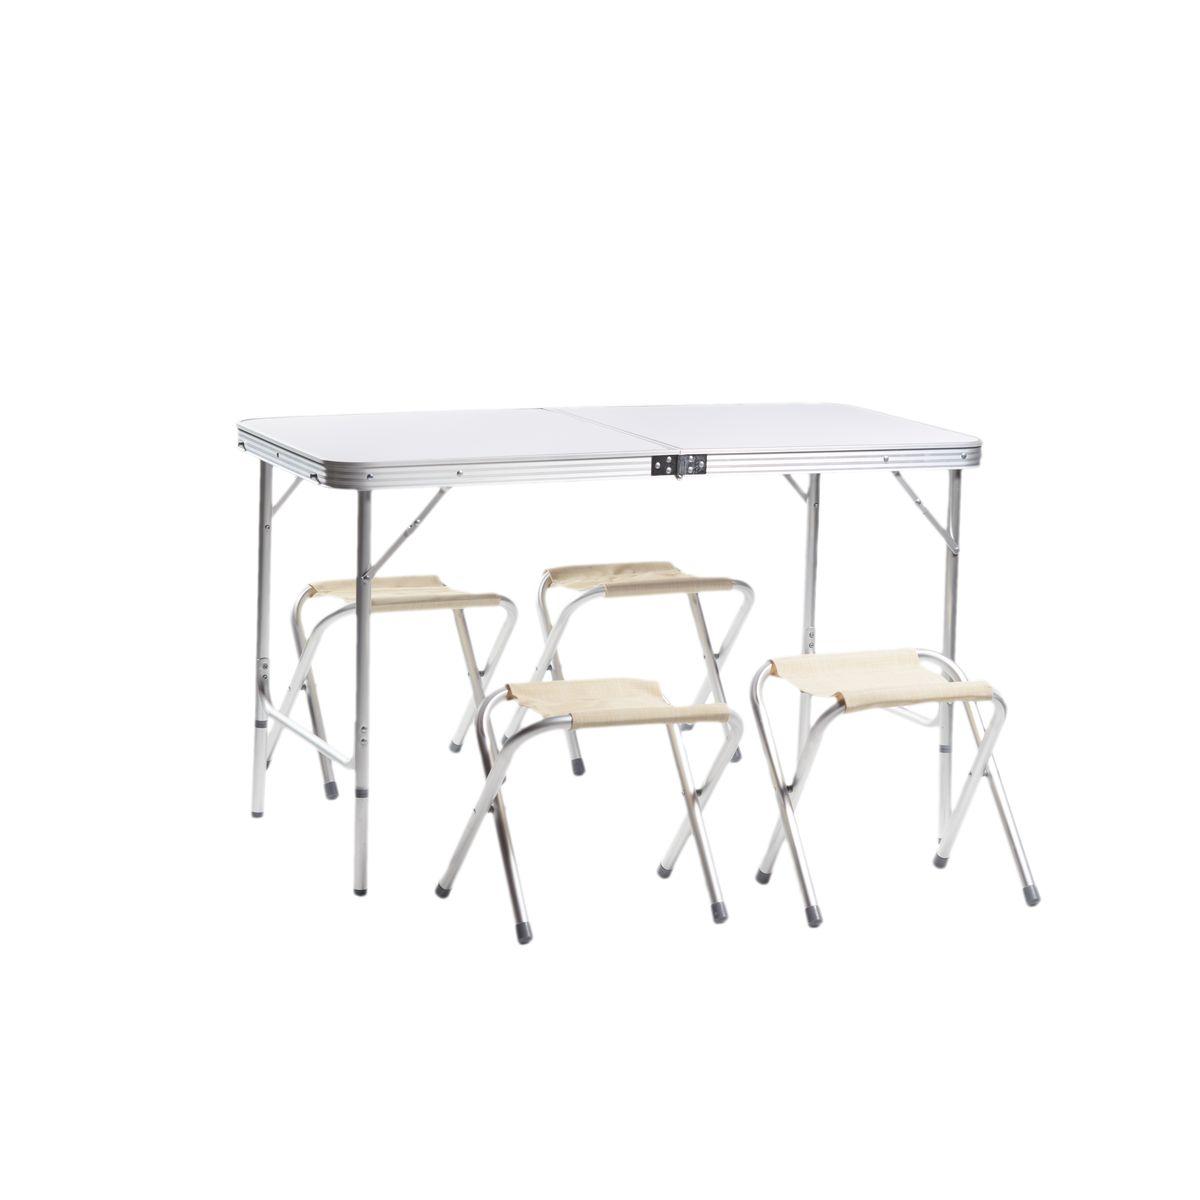 "Набор мебели для пикника Green Glade ""М5102"", 5 предметов"